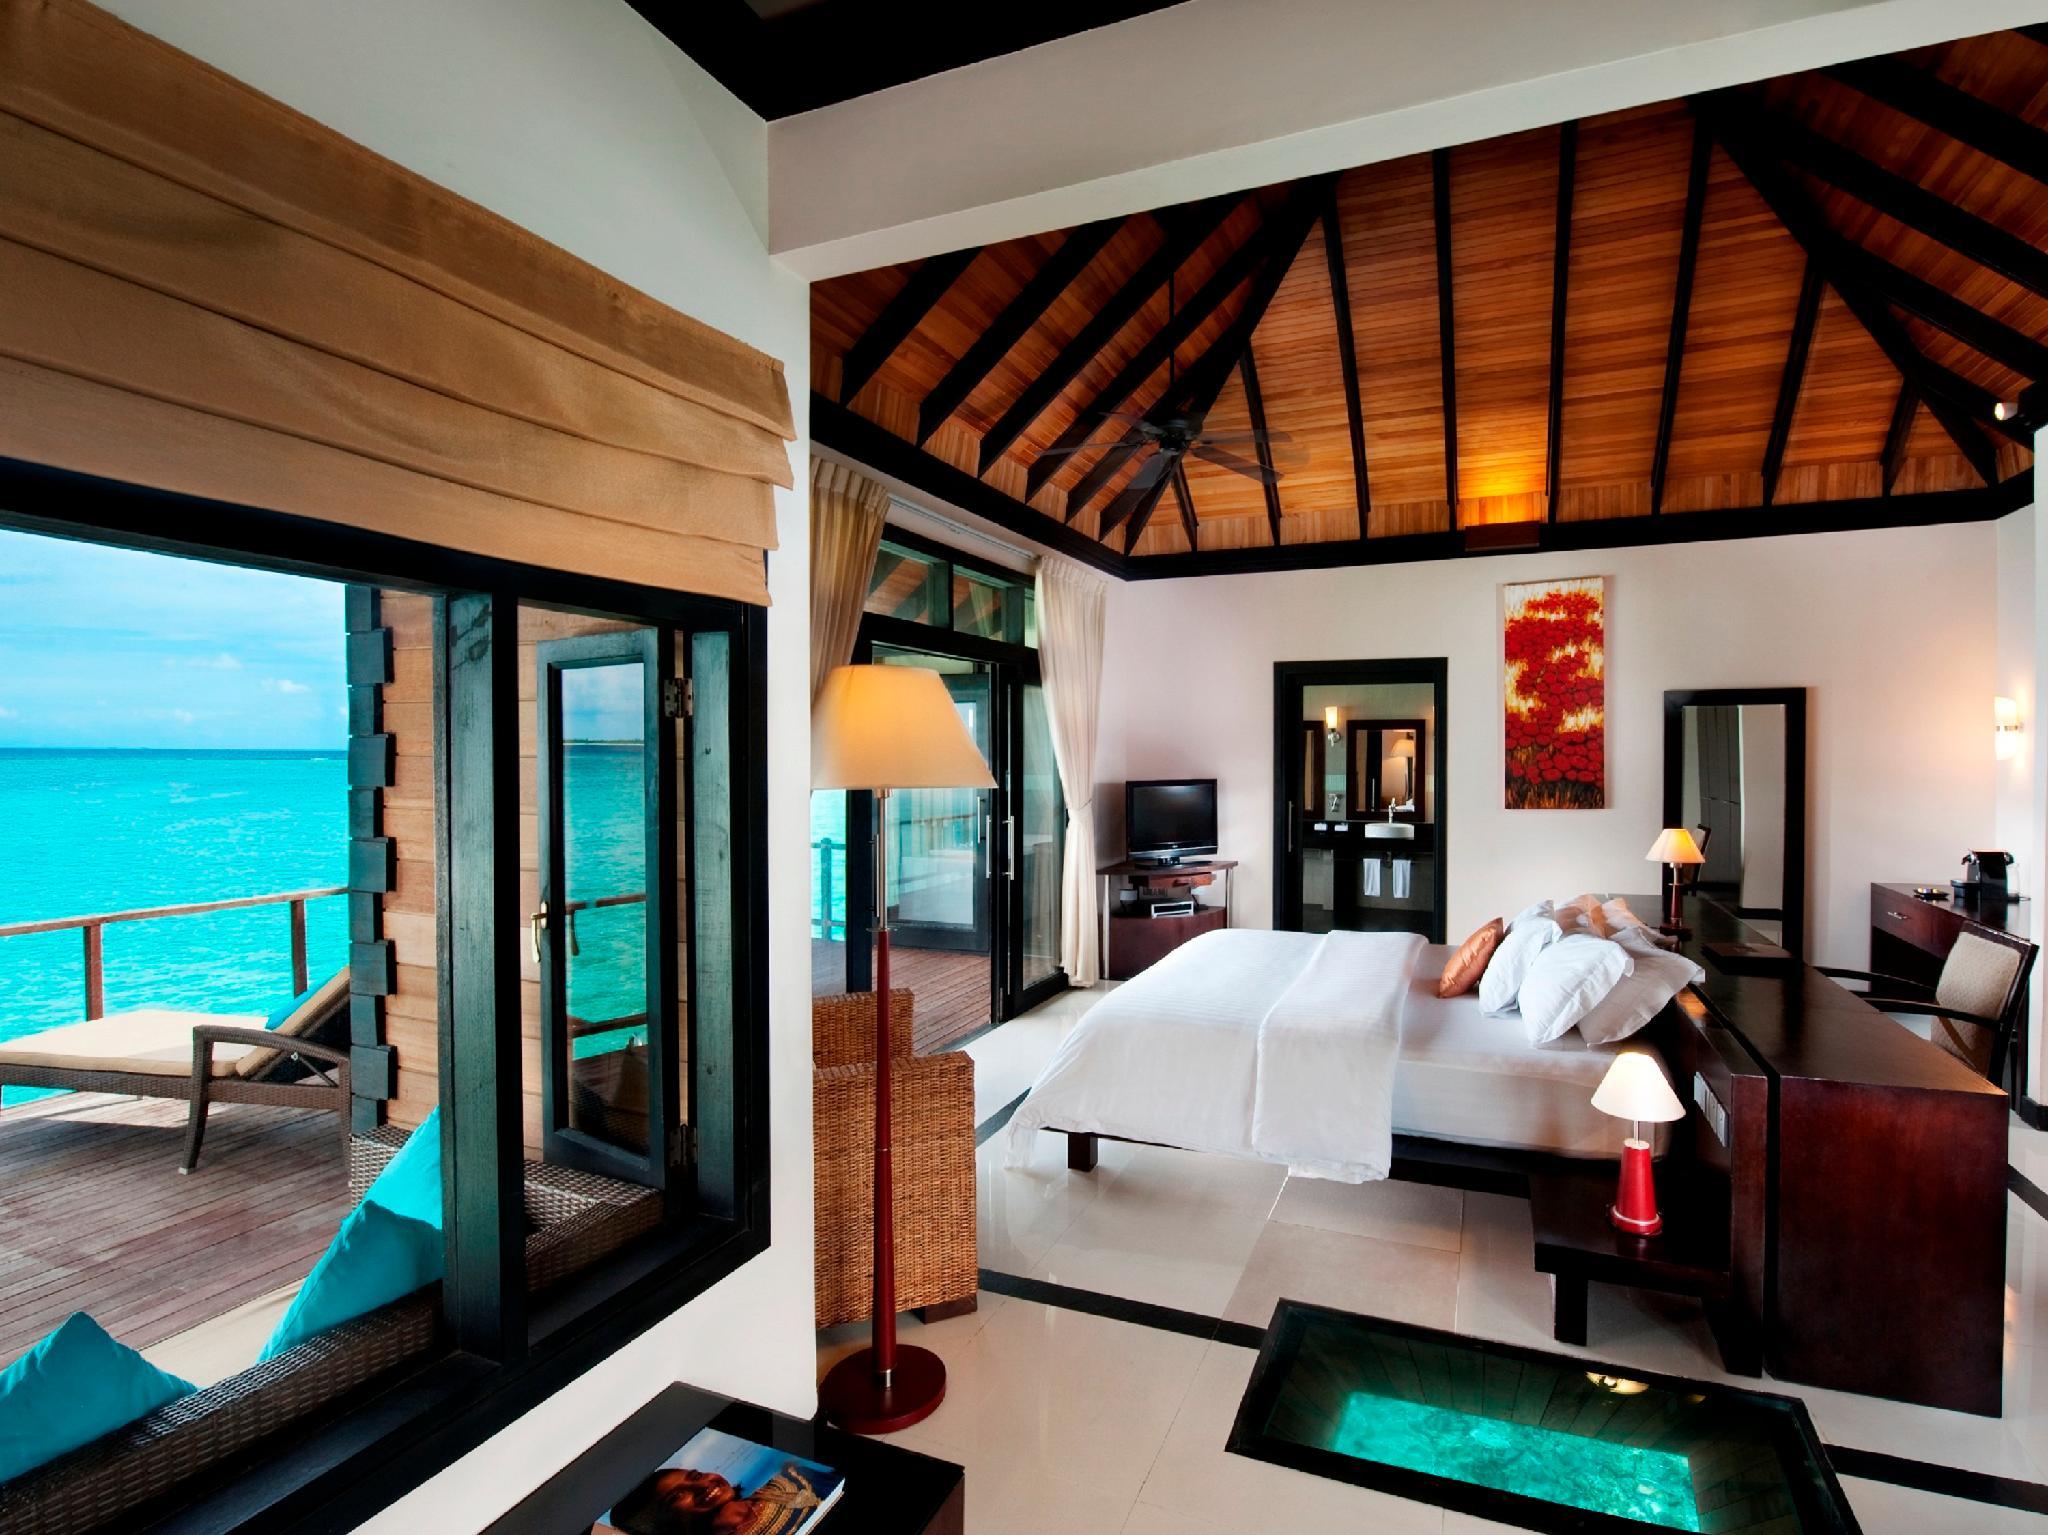 tur na maldivy severnyj male atoll 92 315 rub chel - Тур на Мальдивы Северный Мале Атолл 92 315 руб. чел.